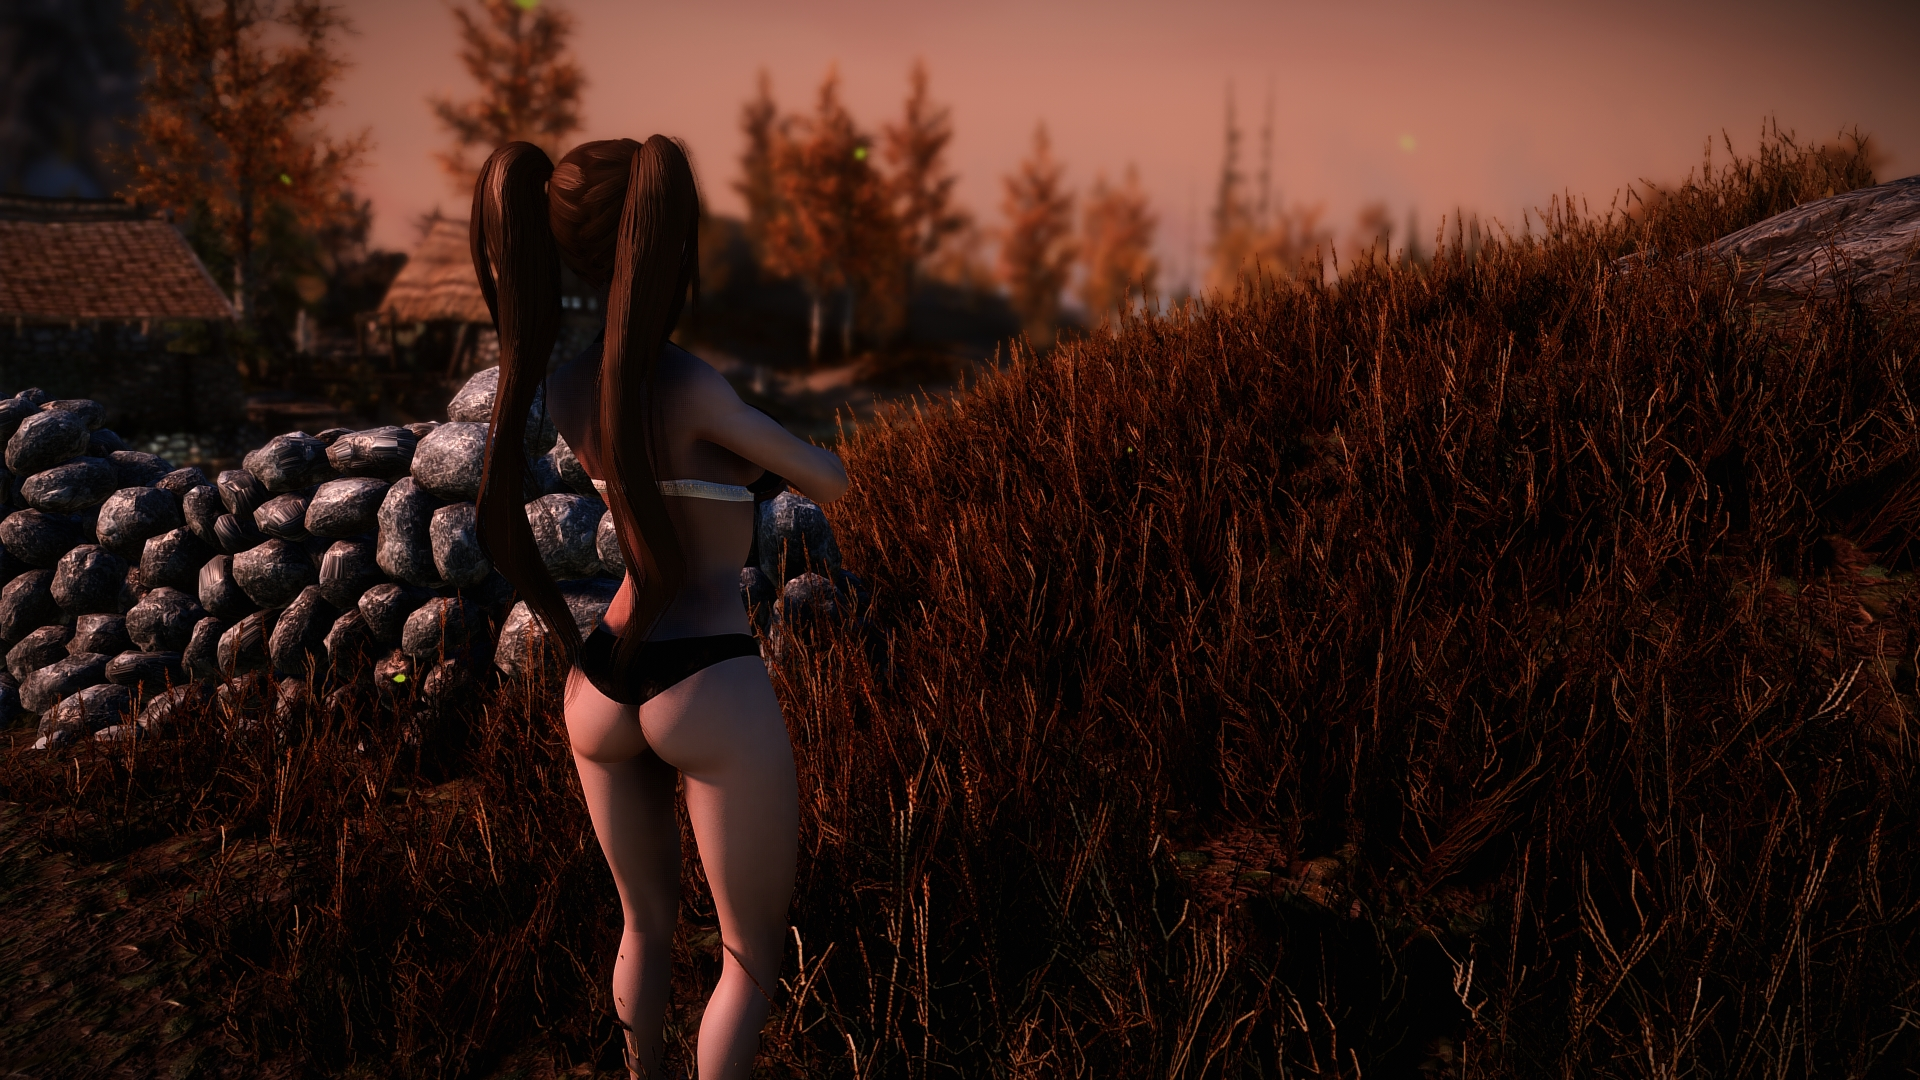 Лидия [бонус] (нон-корова едишн) - The Elder Scrolls 5: Skyrim Лидия, Моды